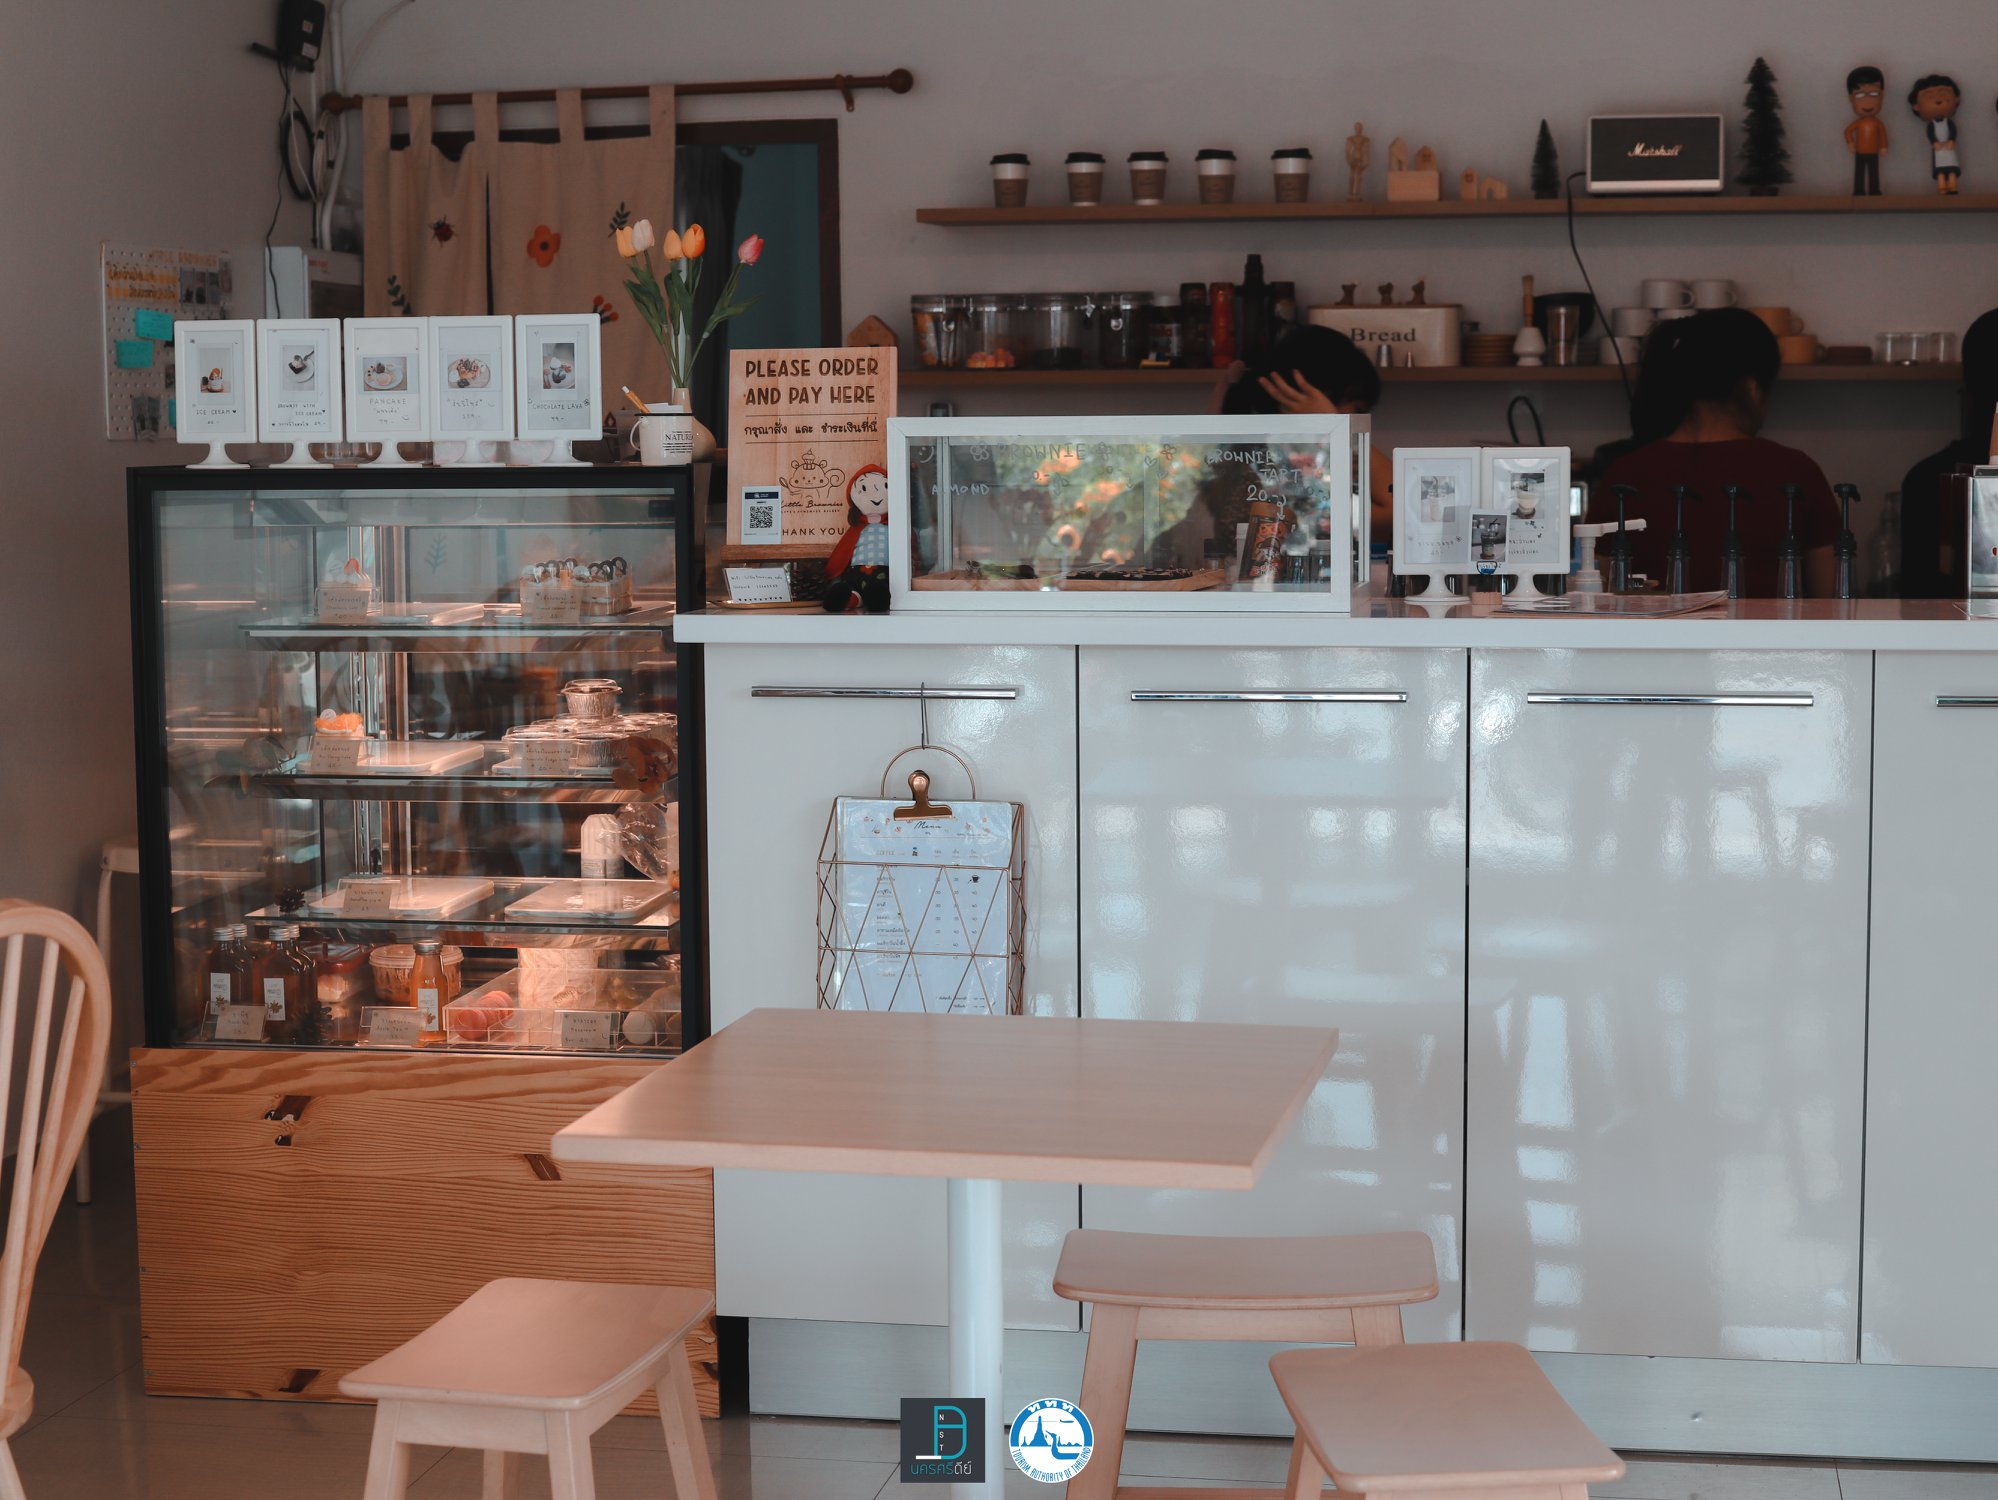 1.-Little-Brownies-เริ่มกันเลยกับร้านแรกของเรา-เป็นคาเฟ่โทนสีขาวน่ารักๆ-ชื่อร้าน-ลิตเติ้ล-บราวนี่-คือบราวนี่อร่อยมวากกกก-เมนูน้ำก็เด็ด-แอดชิมโกโก้มัจฉะ-คือเอาไปเลย-10/10-ทั้งเบเกอรี่และเครื่องดื่มครับ-ร้านบรรยากาศดีนั่งสบายเน้ออ-สงบ-มีน้องๆมานั่งอ่านหนังสือติวกันเยอะครับ คาเฟ่,สตูล,เด็ด,จุดเช็คอิน,อร่อย,ร้านอาหาร,จุดถ่ายรูป,สถานที่ท่องเที่ยว